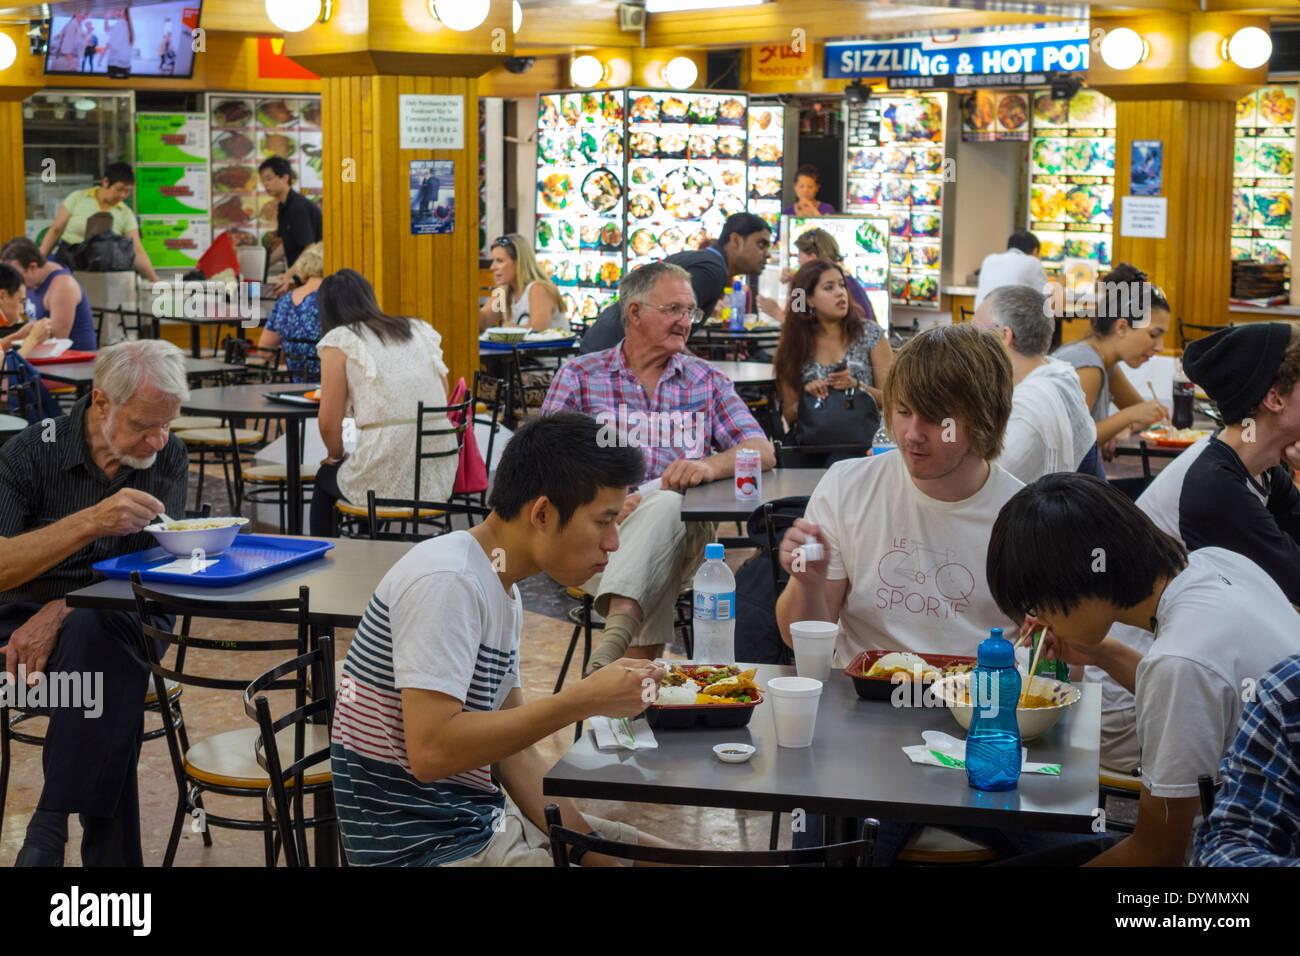 Sydney Australia NSW New South Wales Haymarket Dixon Street Dixon House Food Court uomo asiatico amici mangiare ristorante Immagini Stock